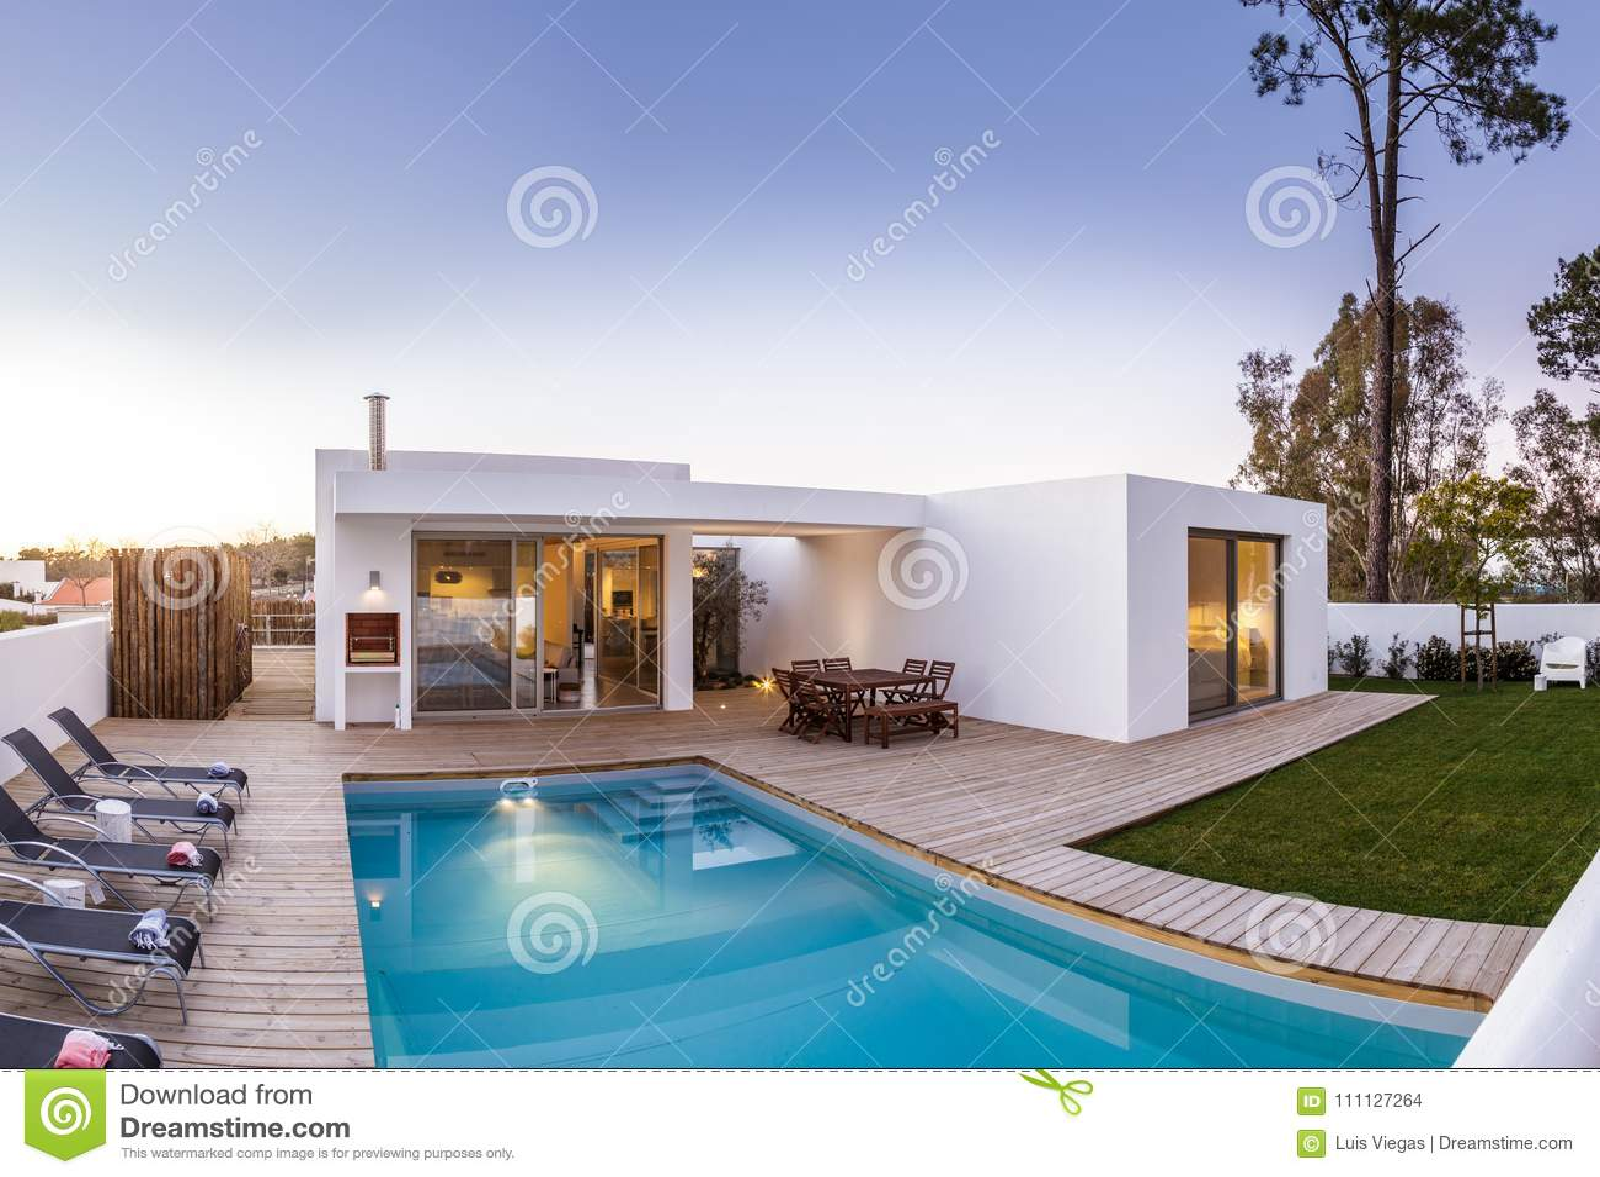 Casa con giardino e piscina casa julia con giardino e for Case indipendenti in vendita genova